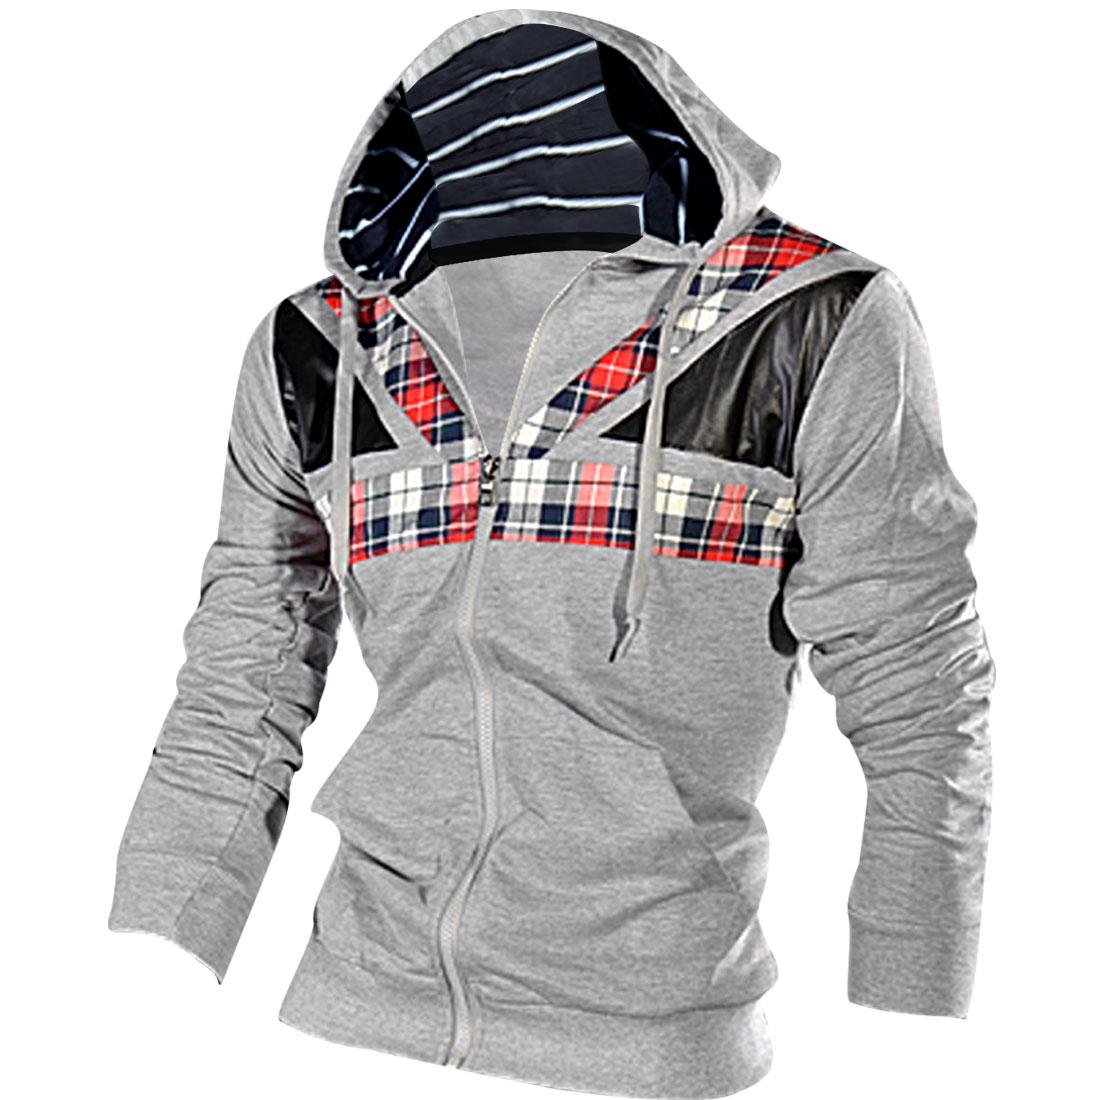 Man's Easy-matching Gray Spliced Design Plaids Hoodie S